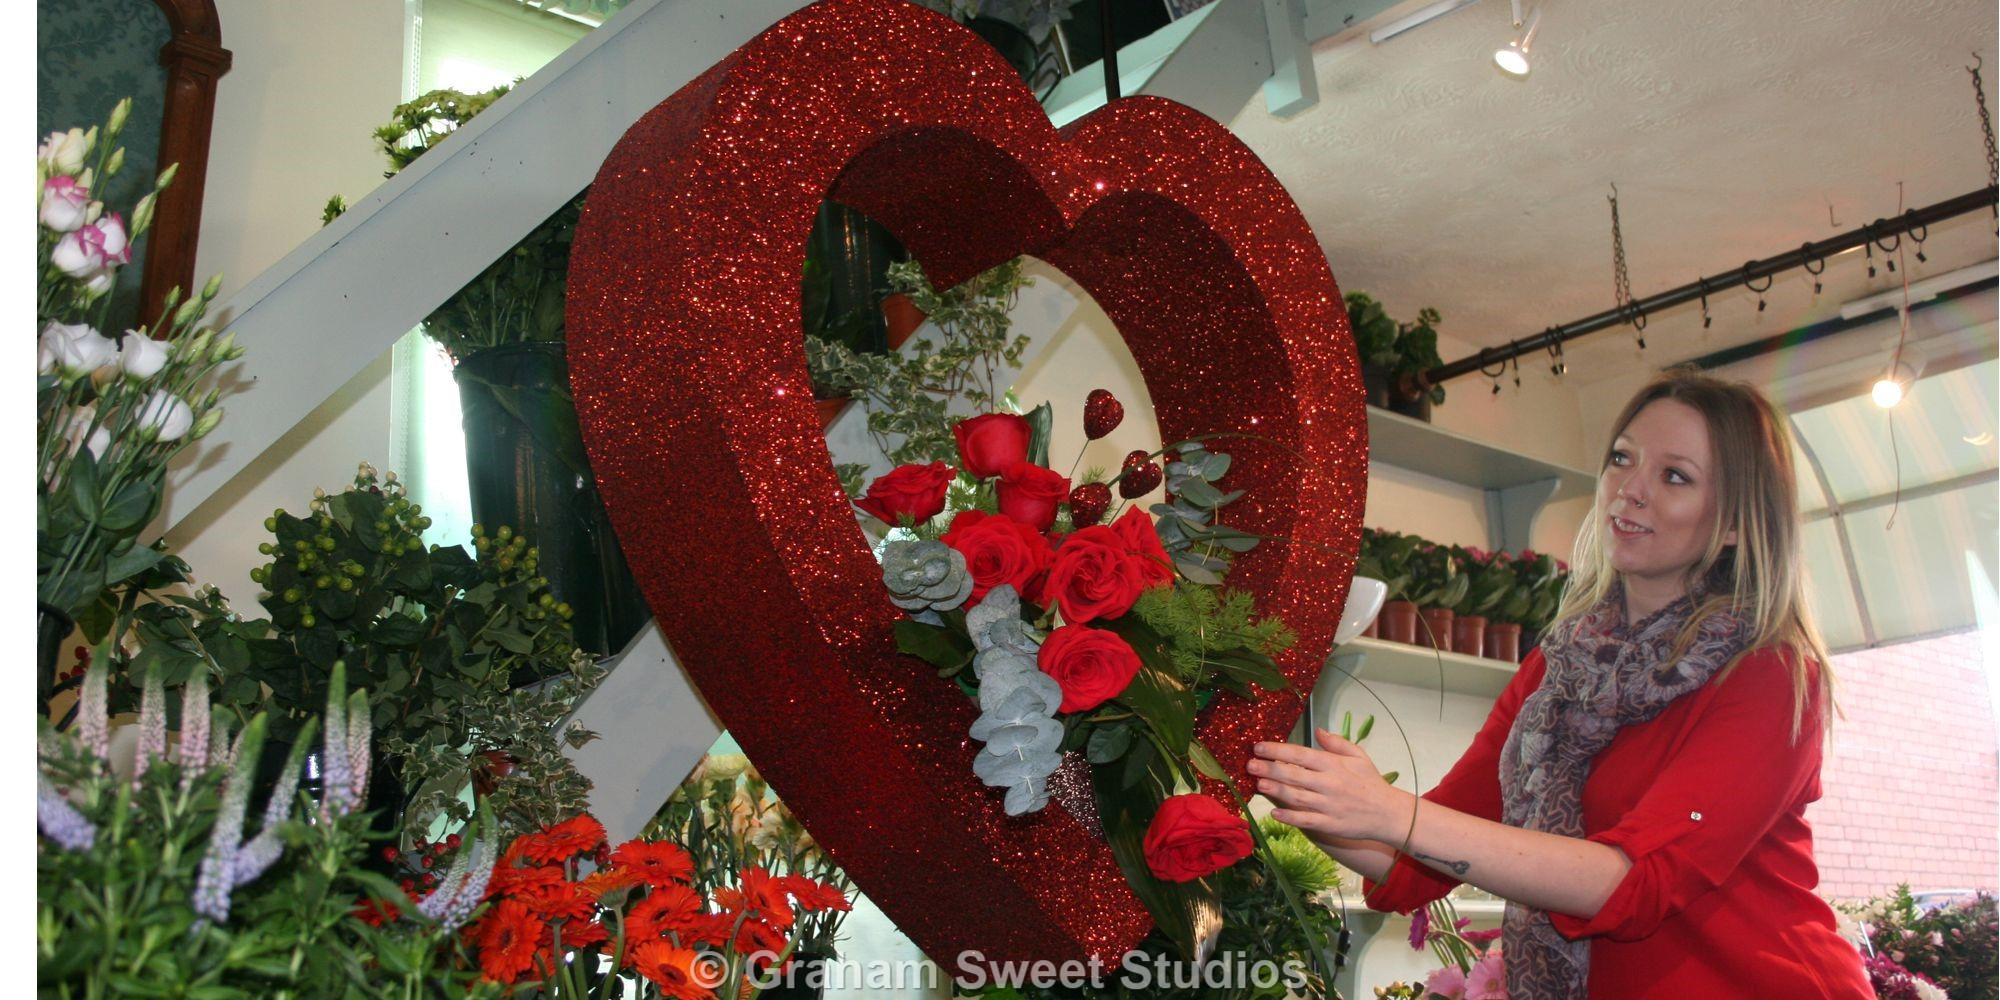 Valentine Heart VM Display Shelves From Polystyrene